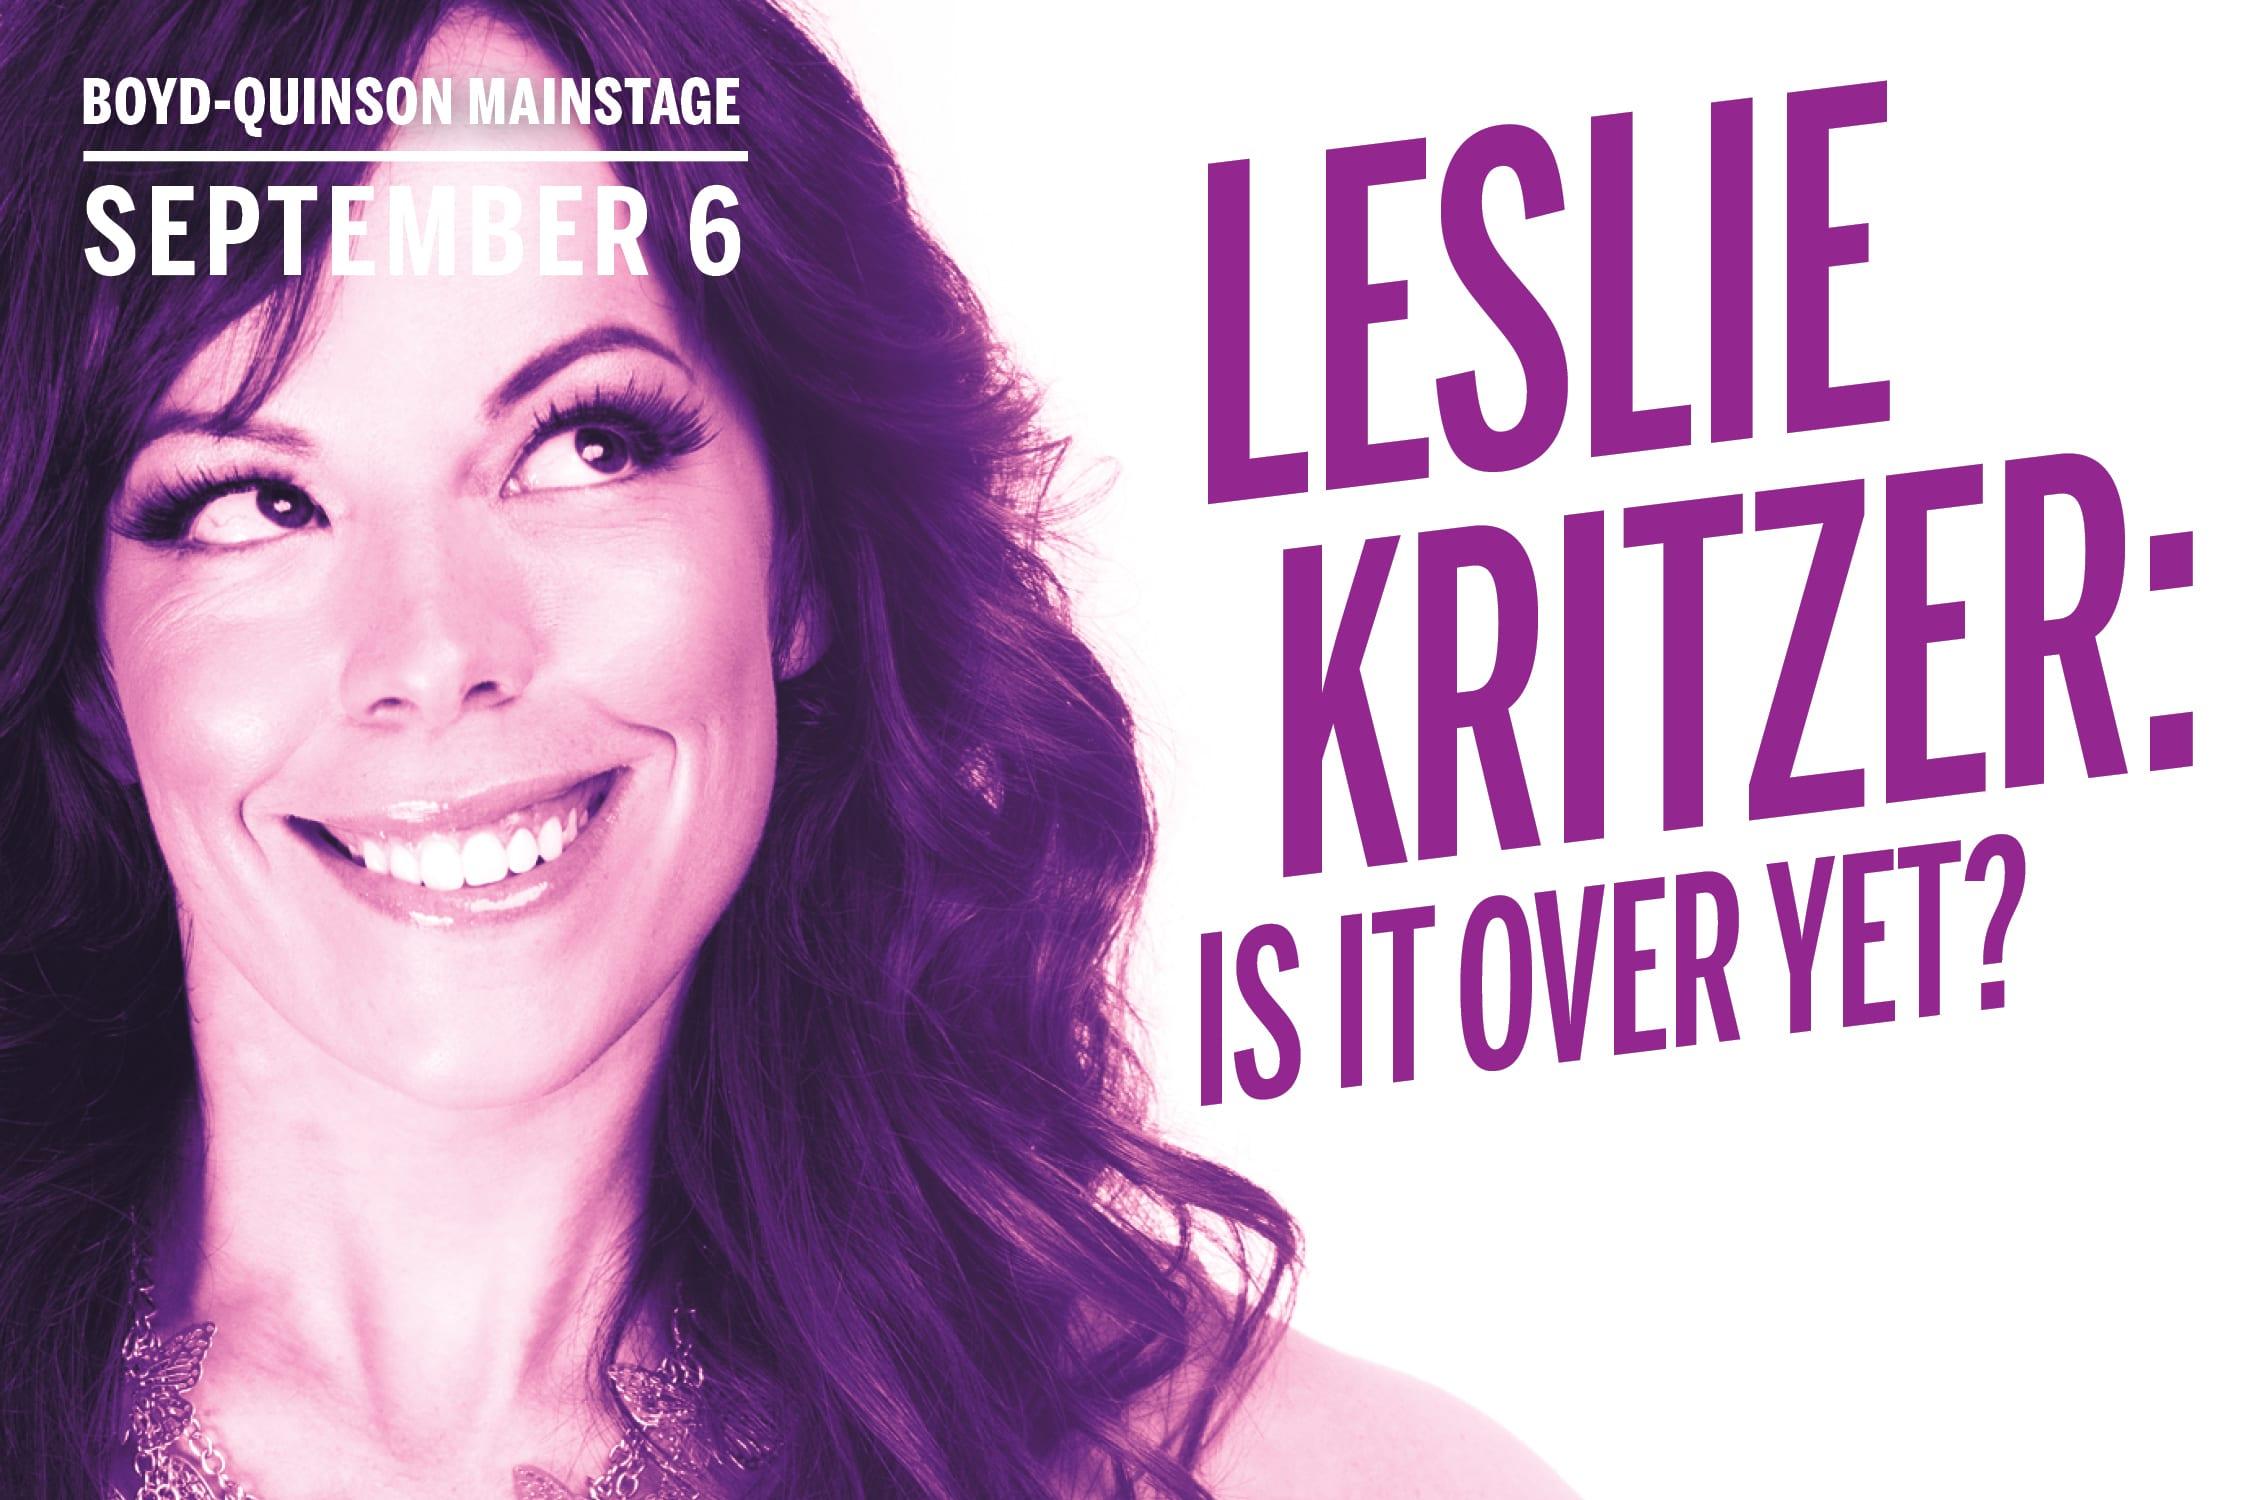 Leslie Kritzer